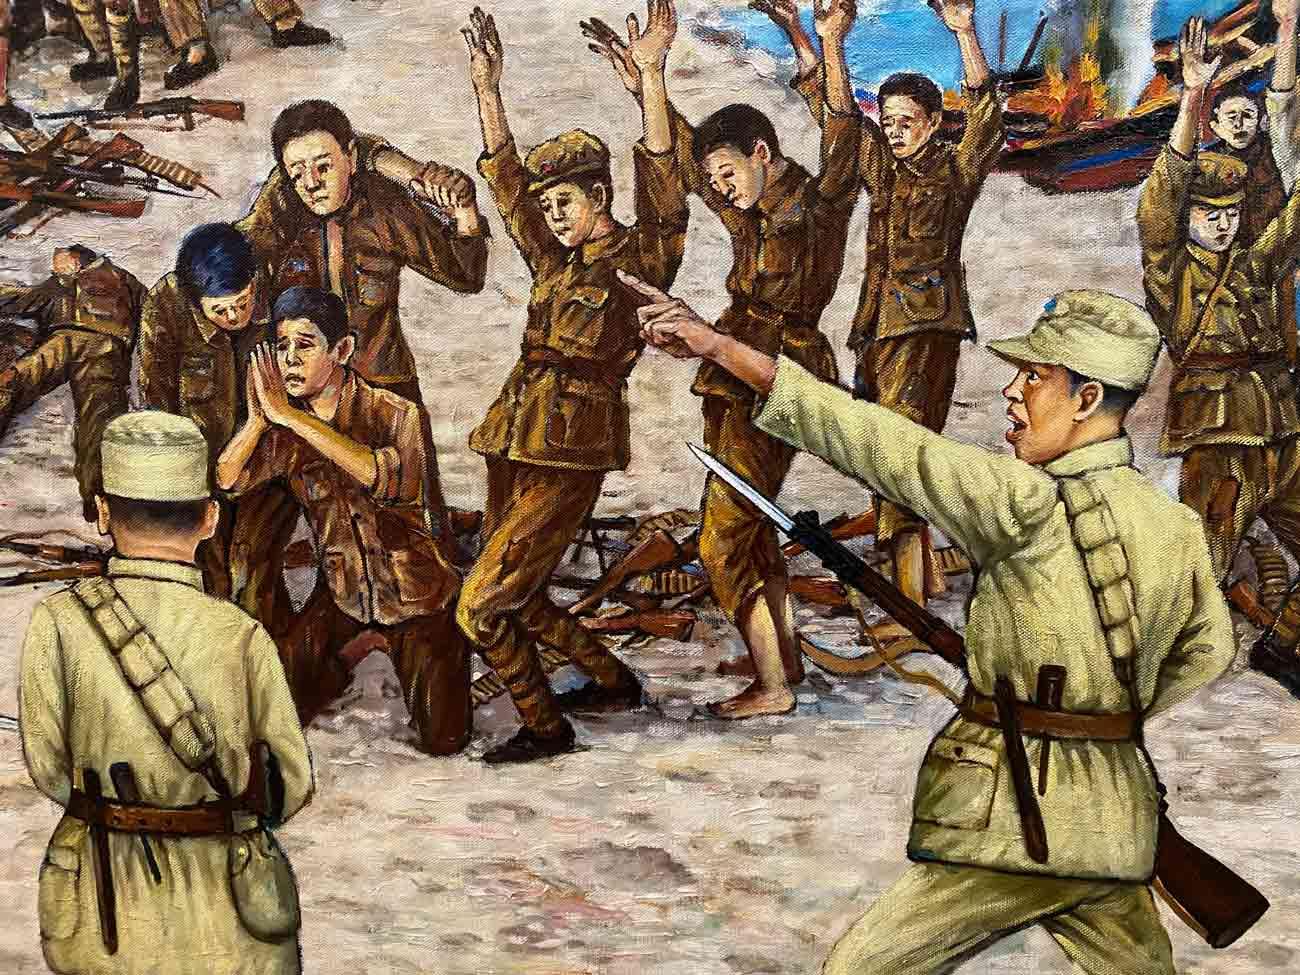 taiwan roc nationalist army defeats pla